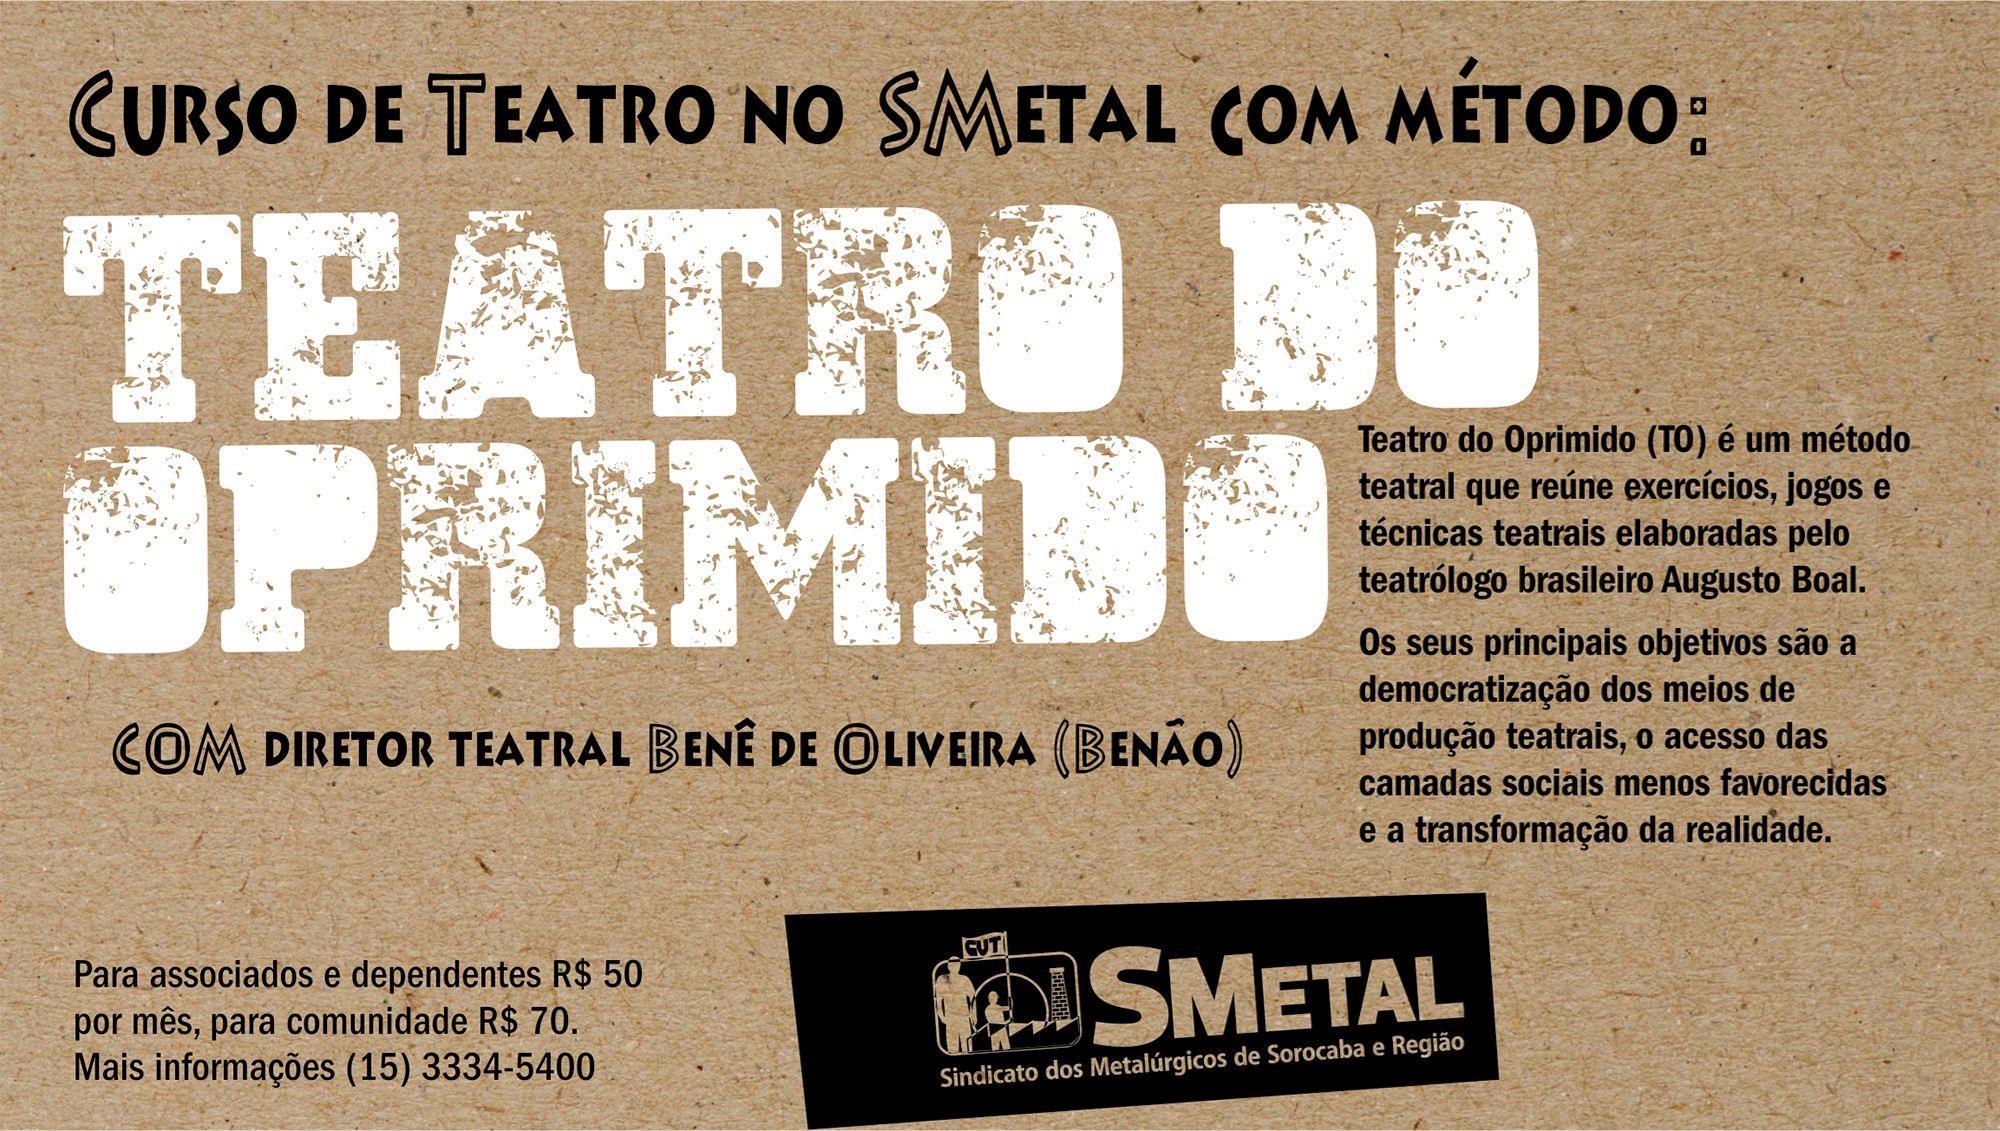 teatro, oprimido, Arte: Cássio Freire